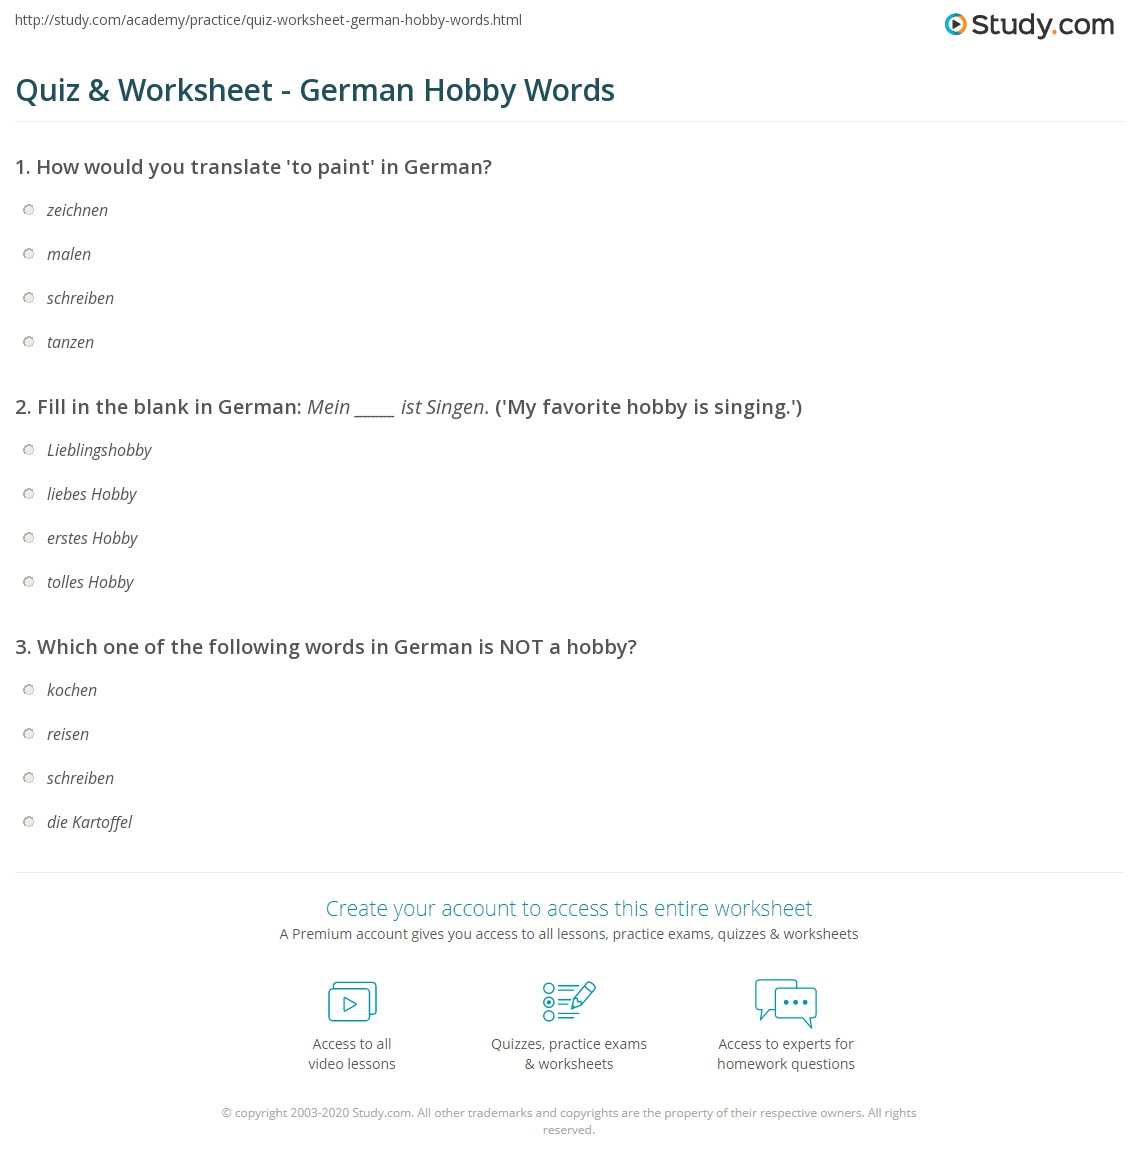 Favorite hobby quiz